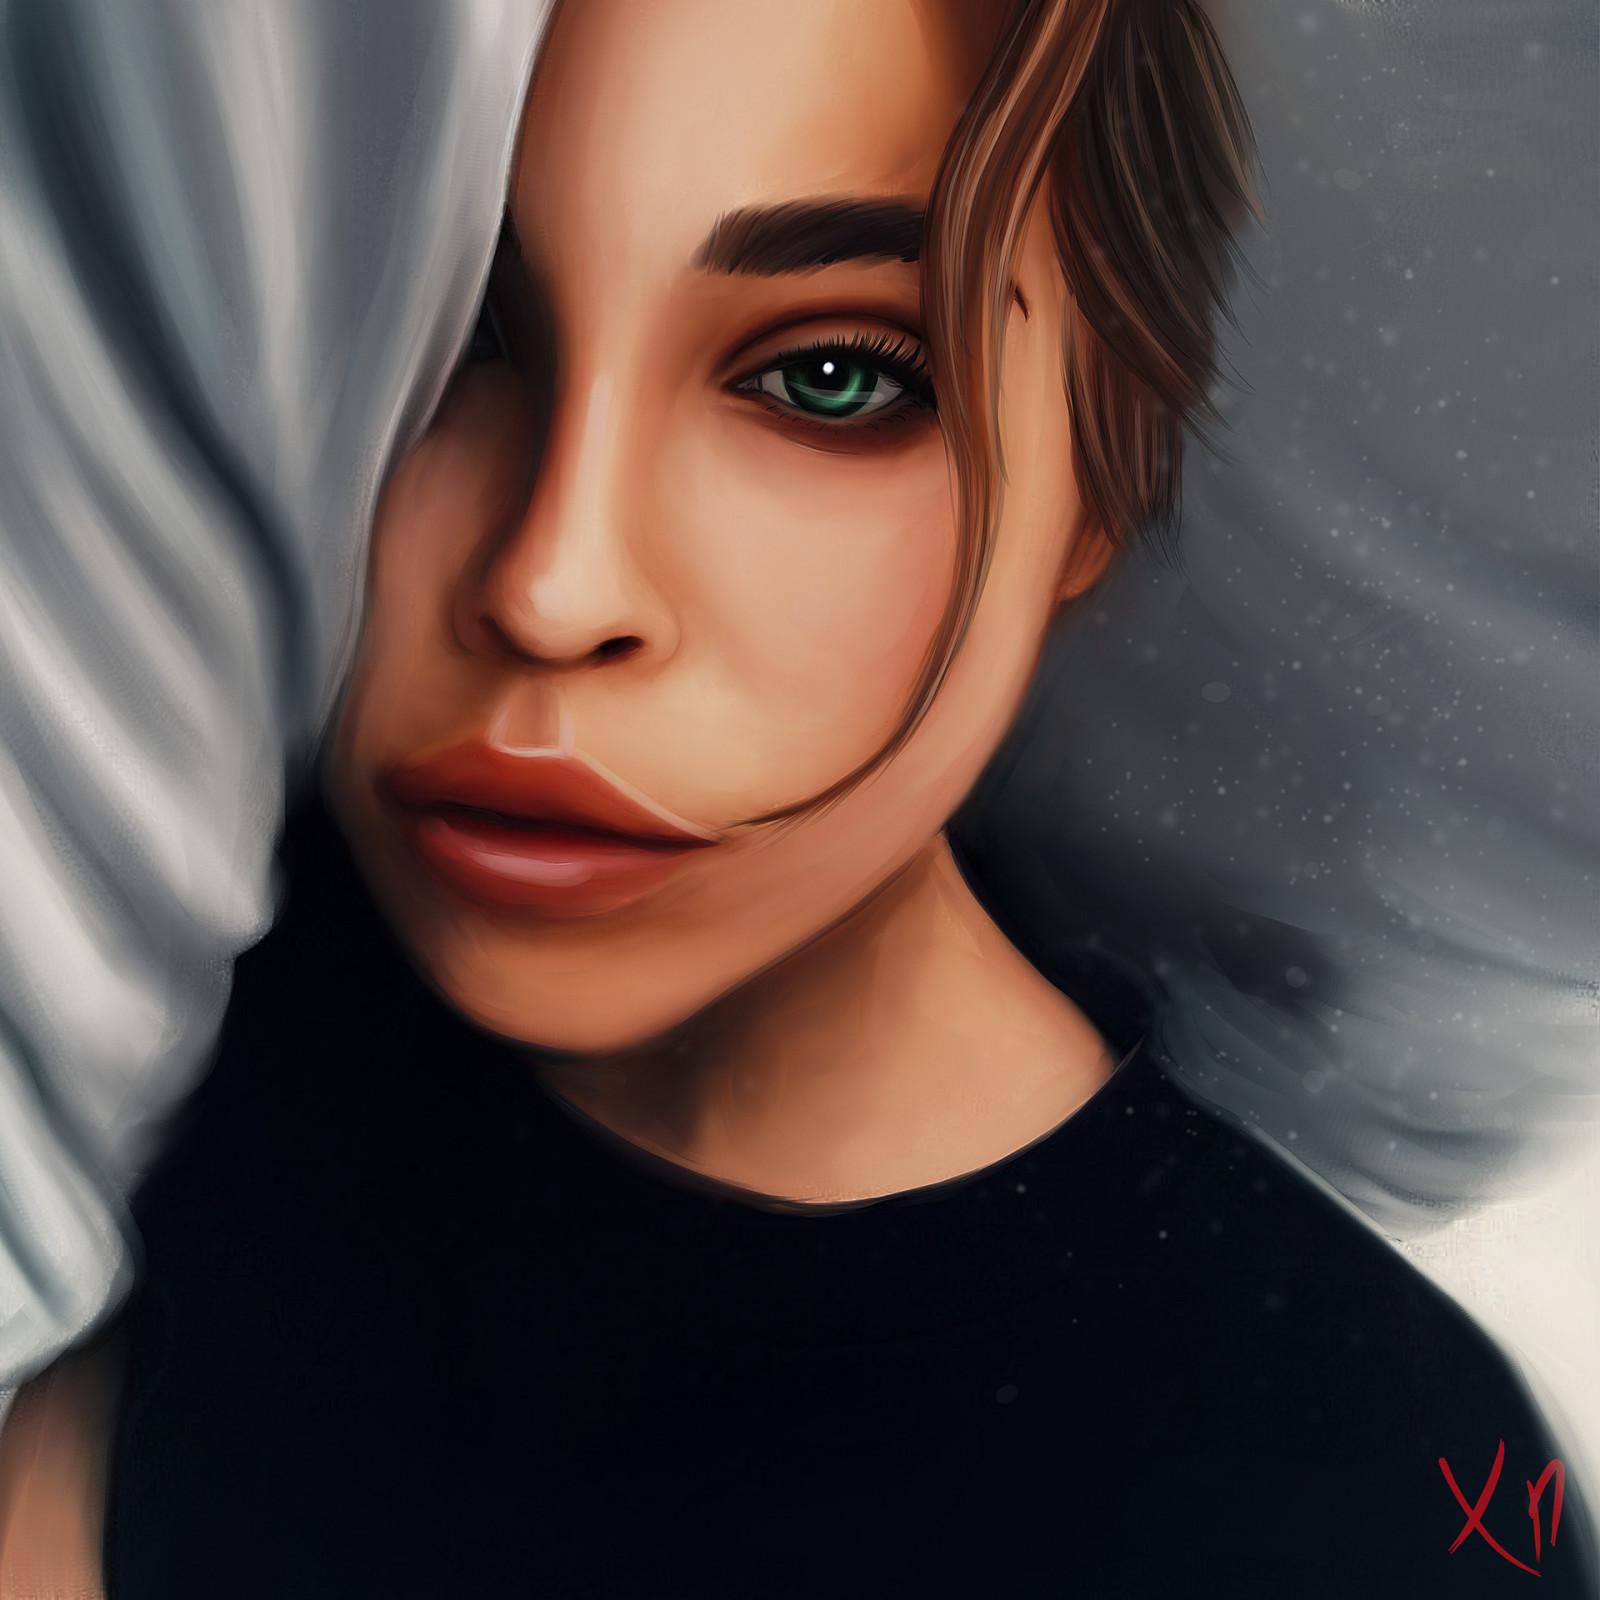 Fond d 39 cran femmes xilston arts portrait 1920x1920 for Fond ecran portrait